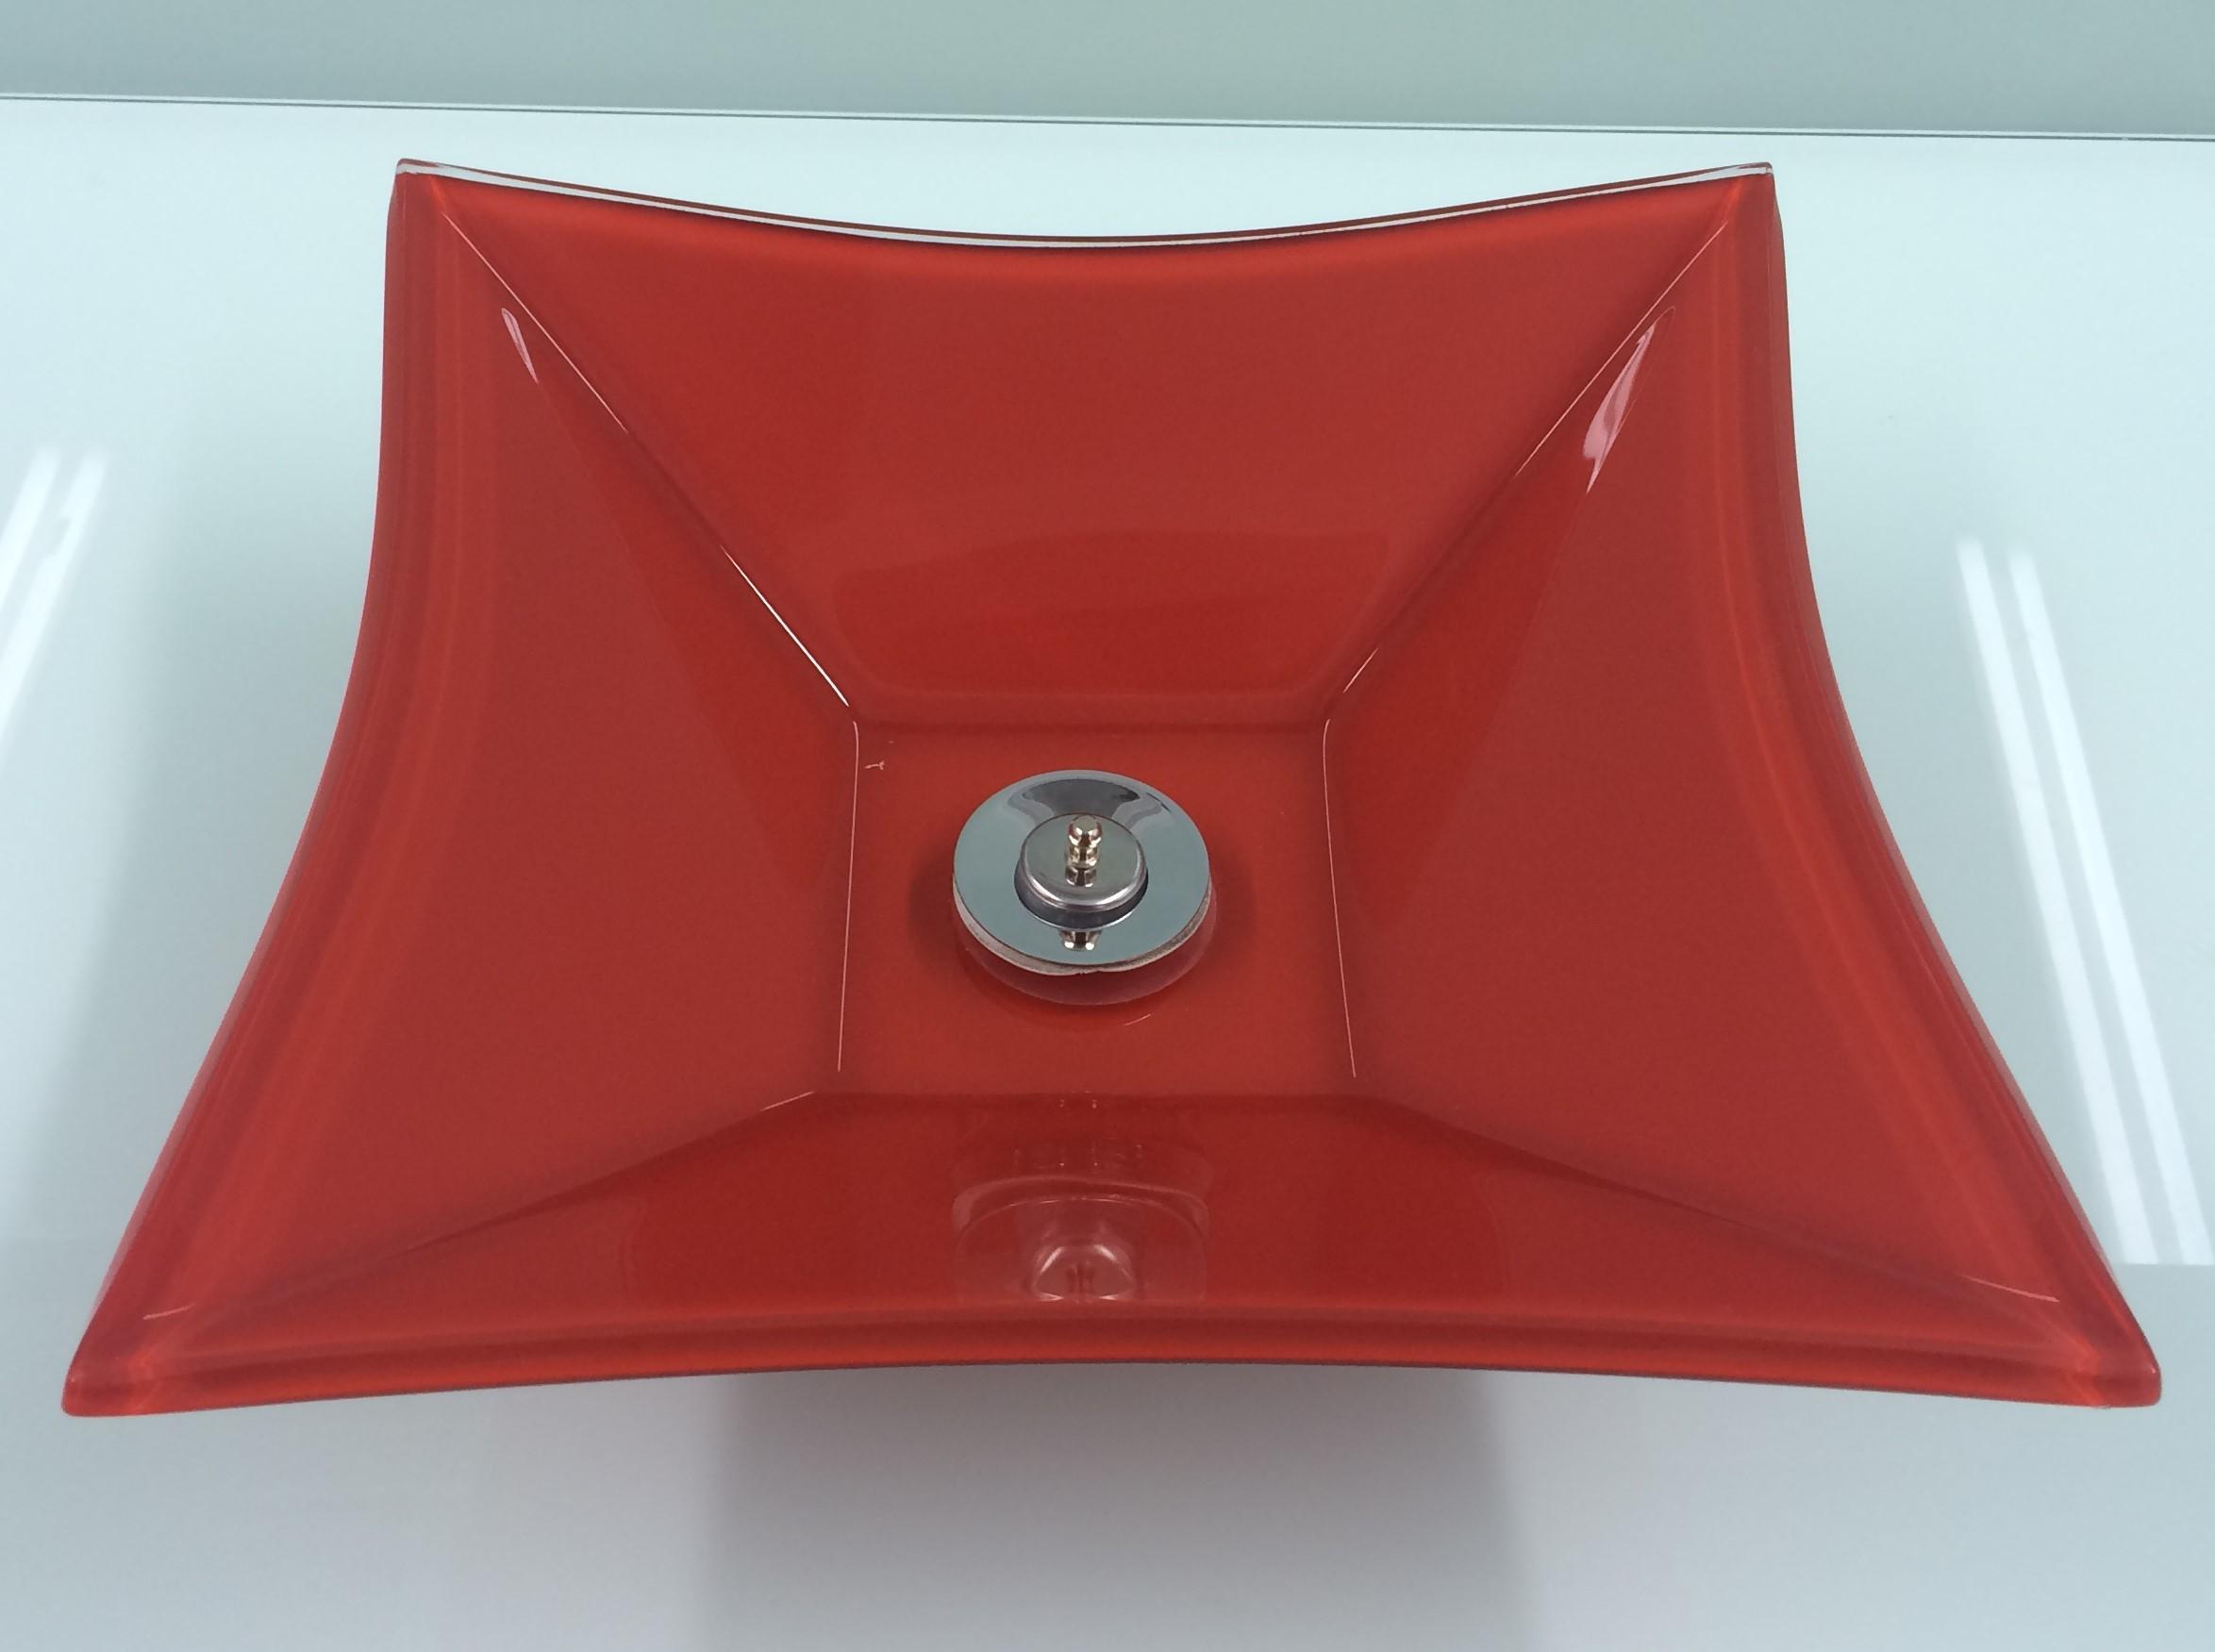 Cuba de Vidro Bergan - Sulle 41 x 31,5 cm 10 mm Vermelho